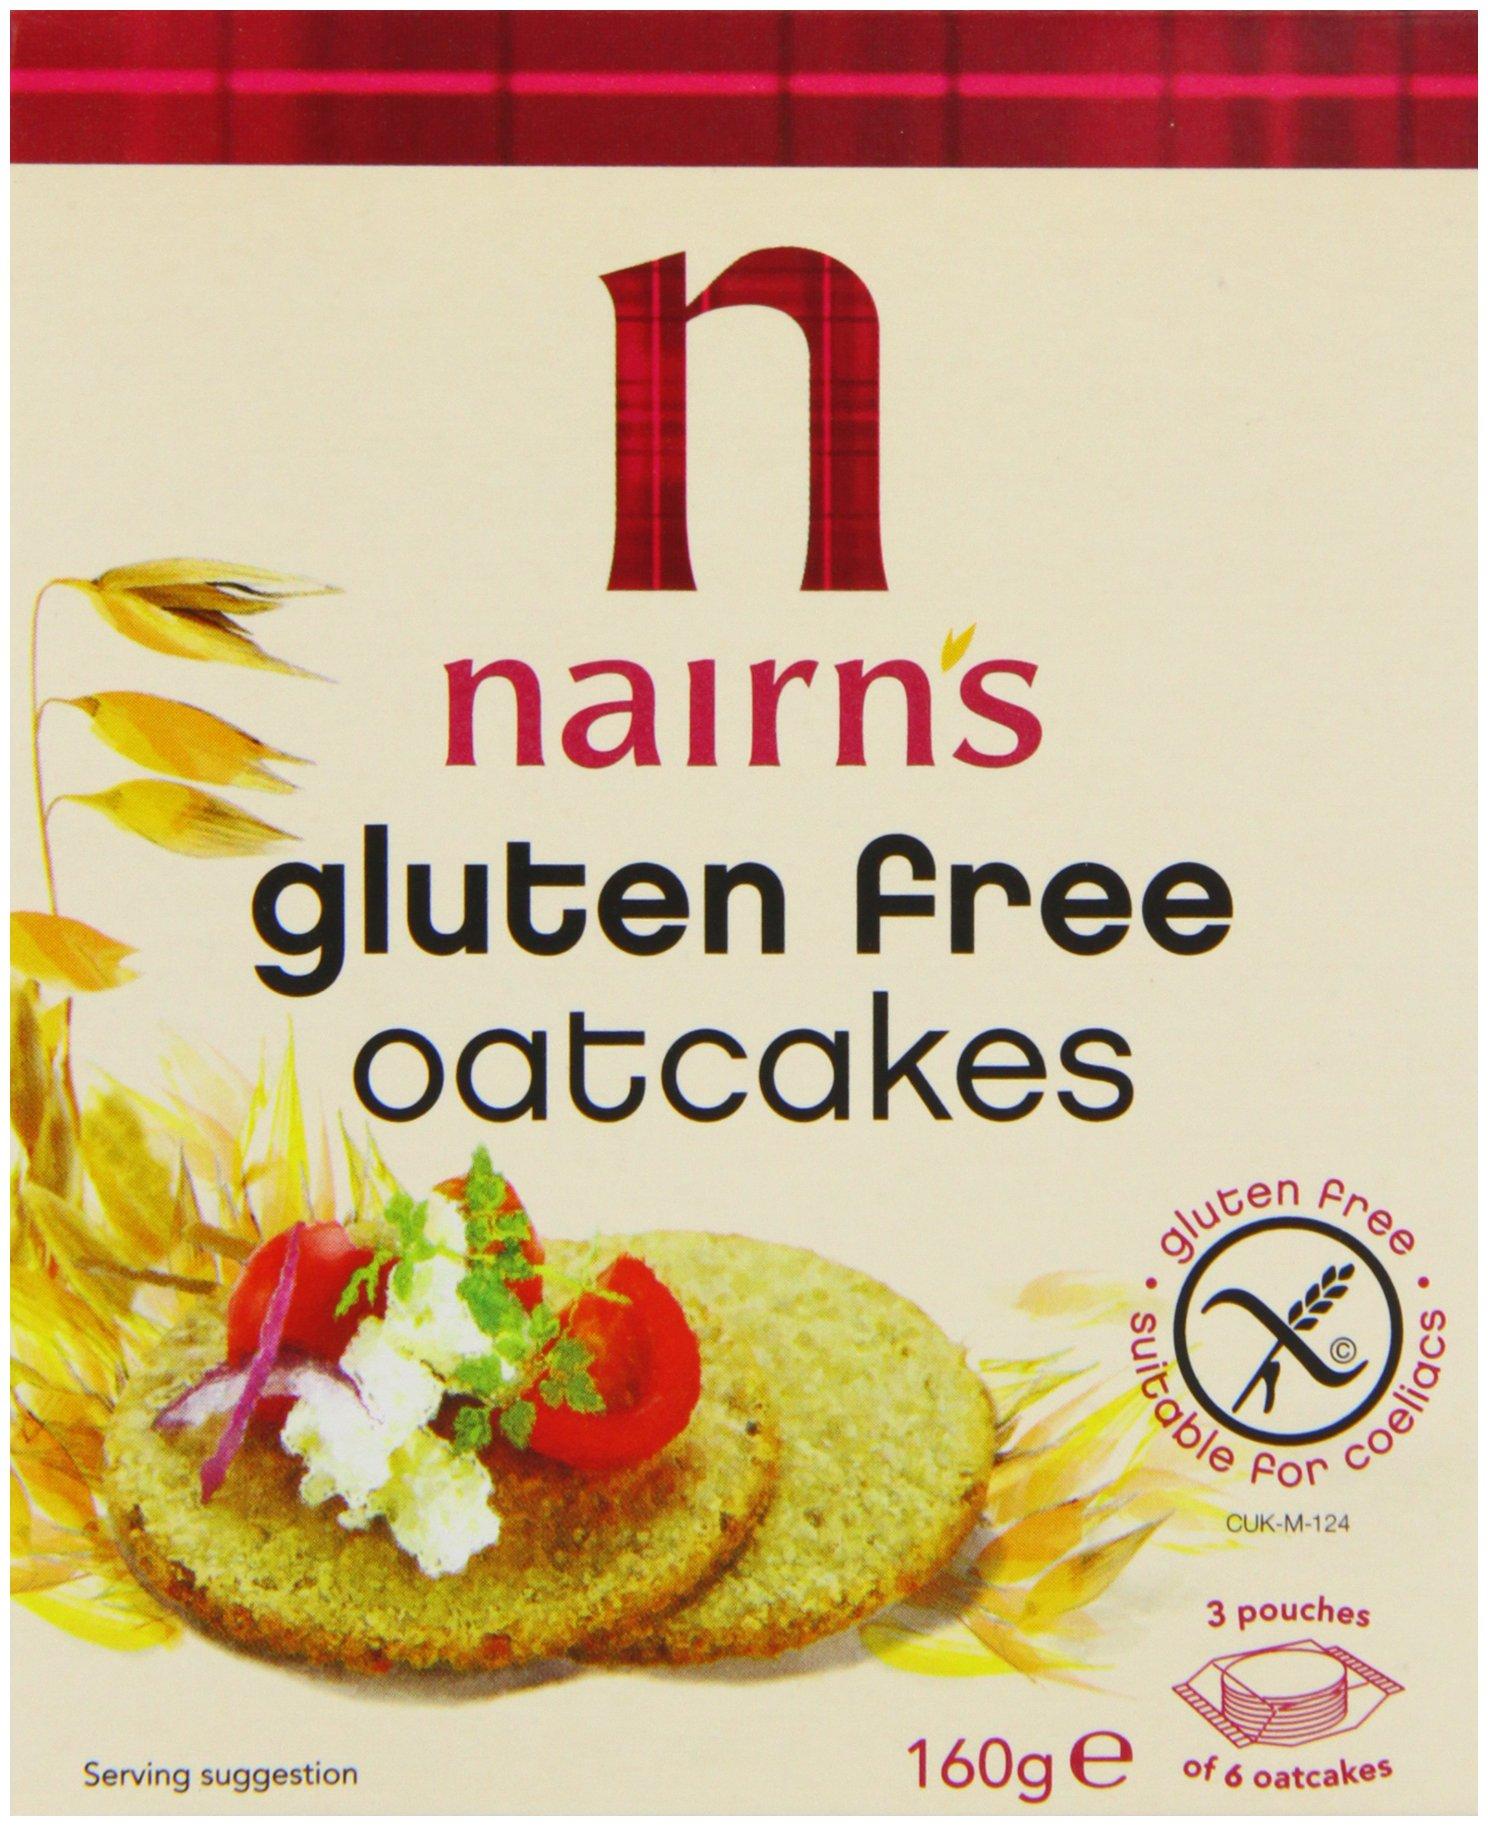 Nairn's Gluten Free Oatcake 160g - Pack of 6 by Nairn's